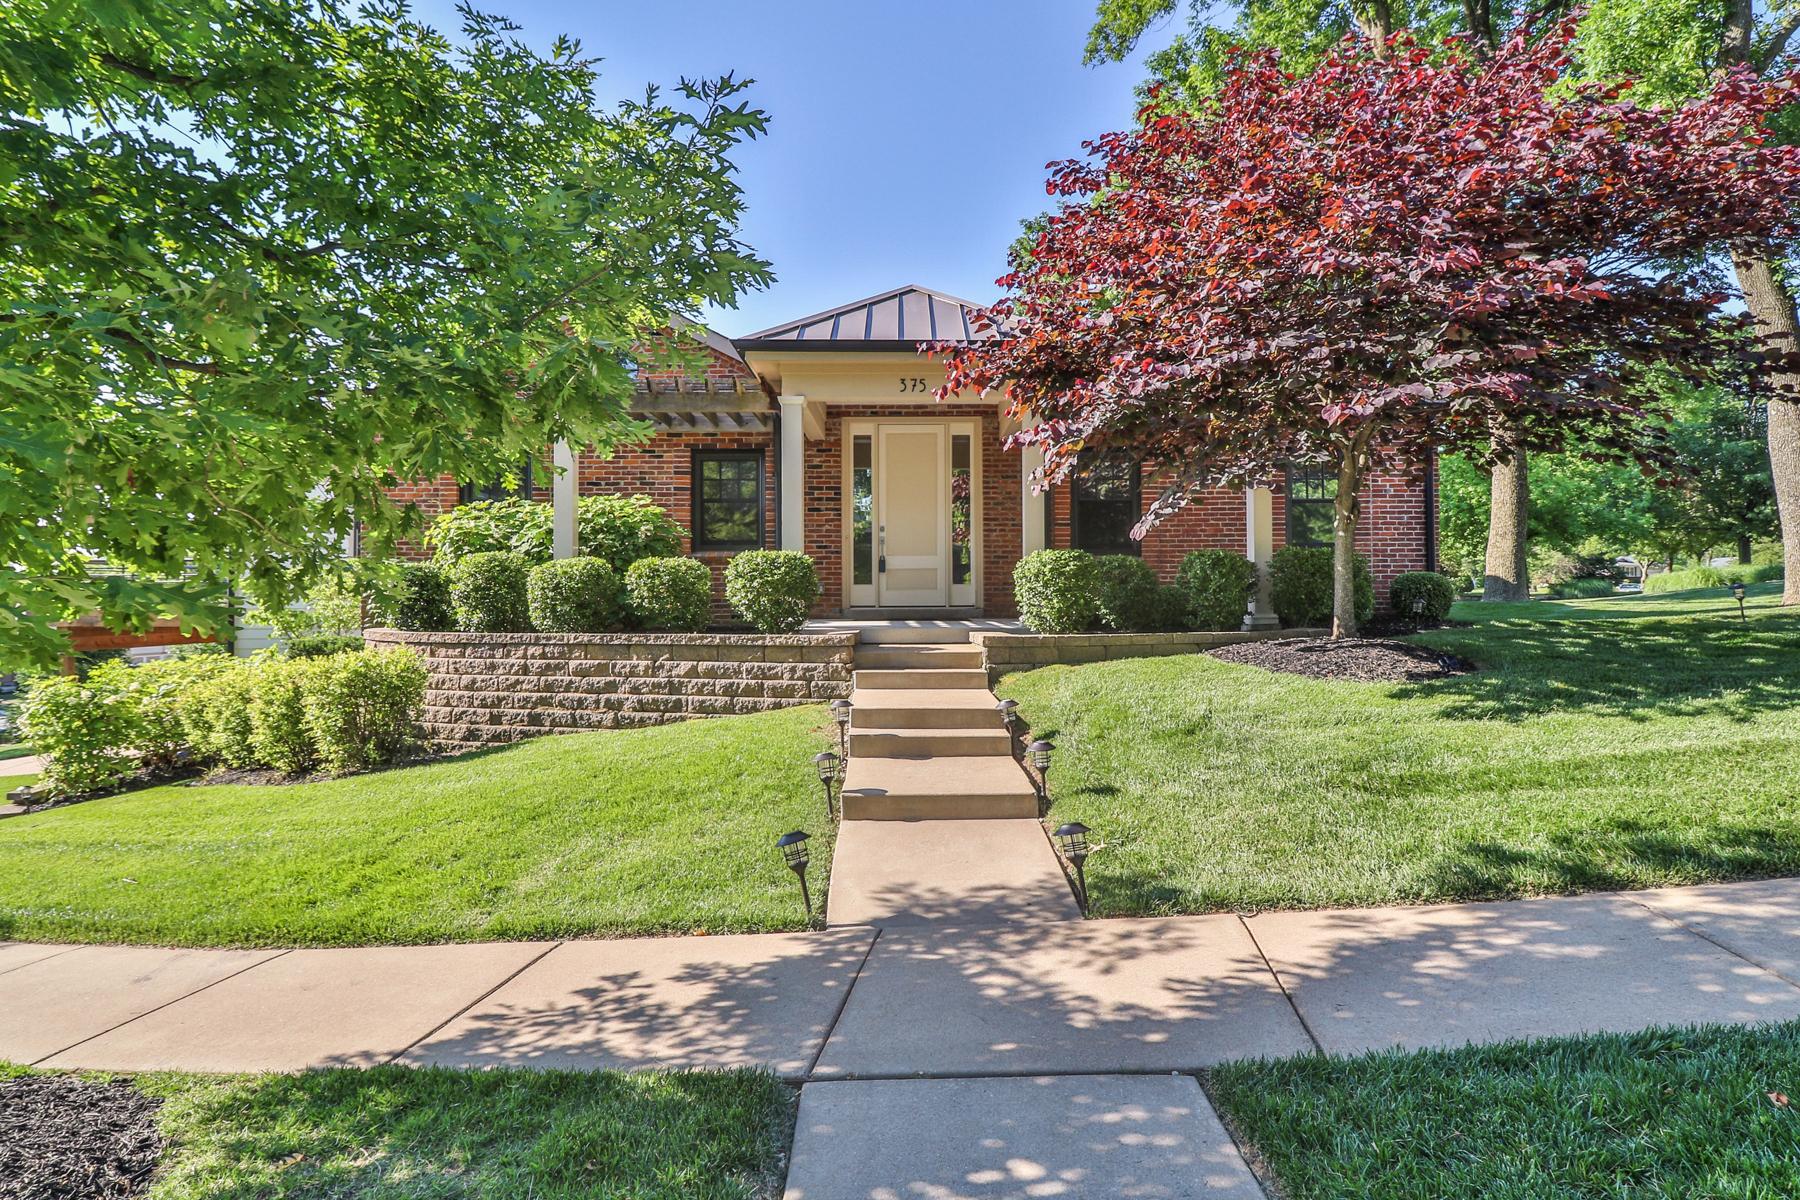 Condominium for Sale at Champion Way Drive 375 Champion Way Drive Ballwin, Missouri, 63011 United States